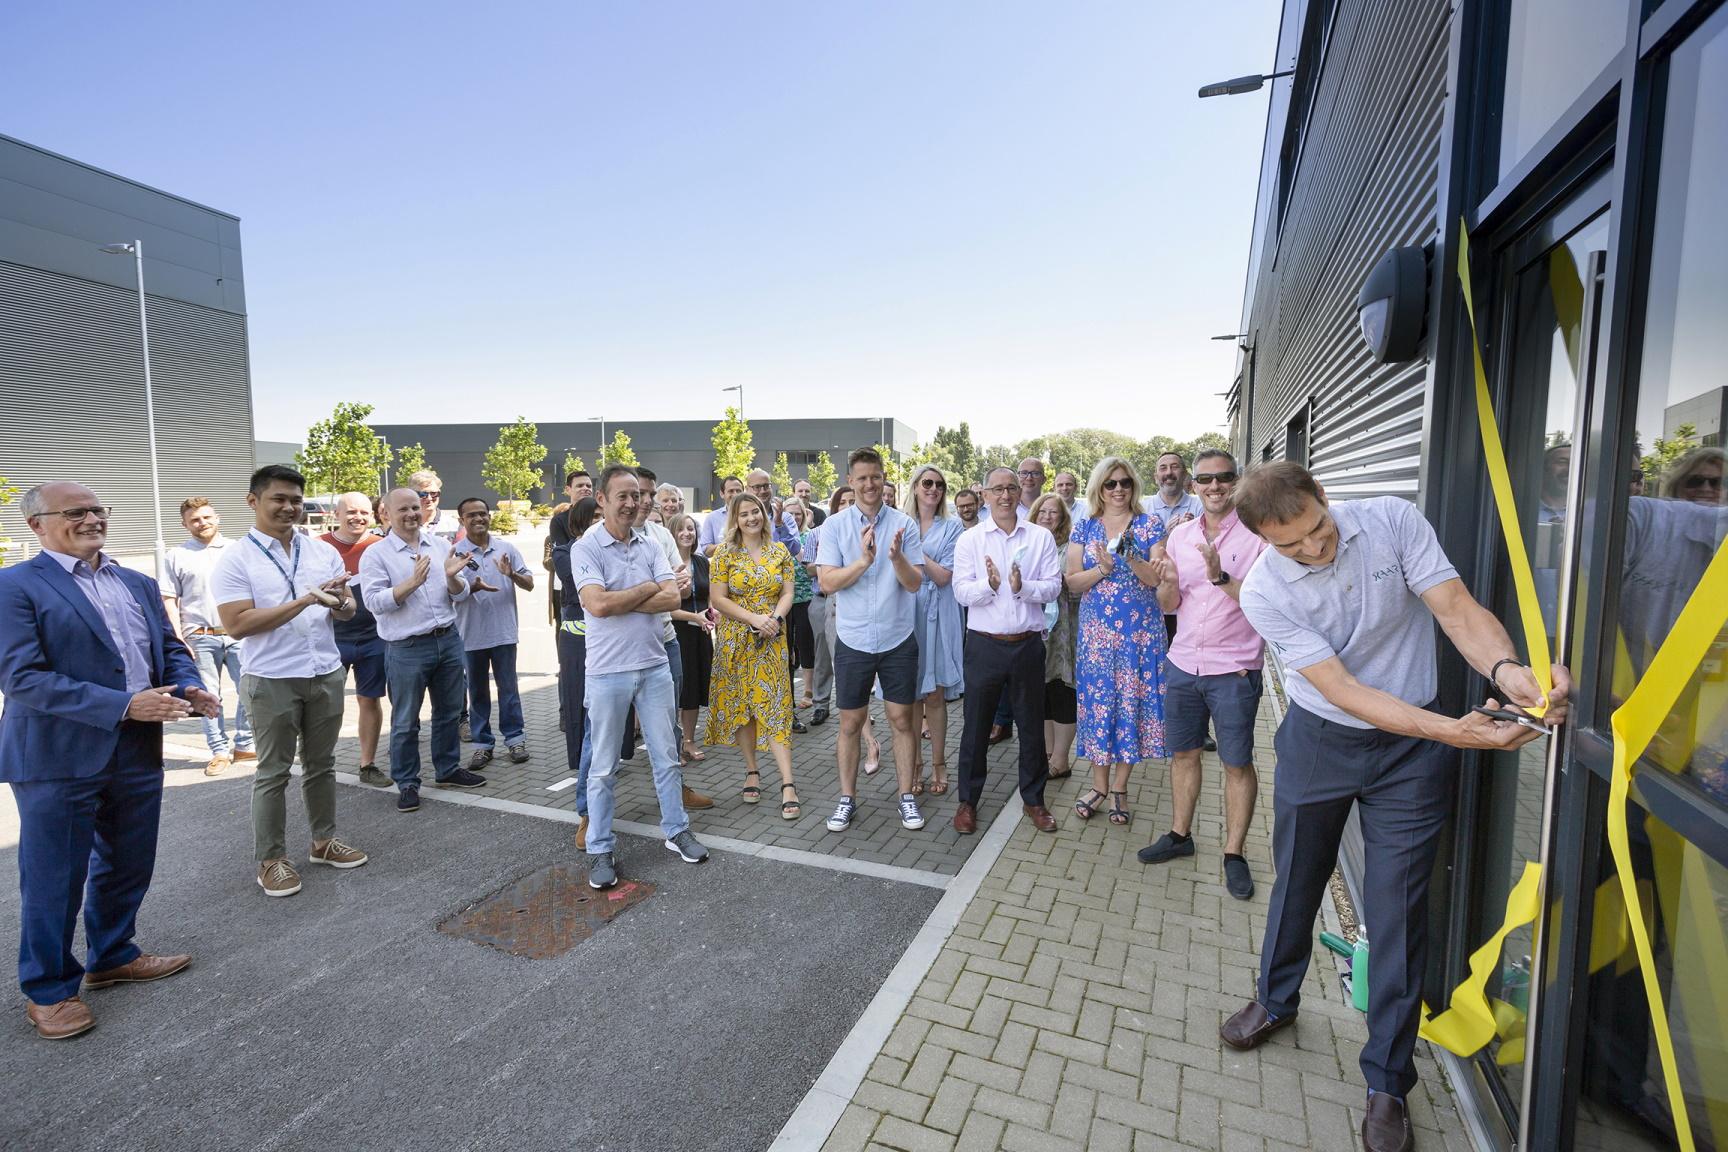 The opening of Xaar's new headquarters. Photo via Xaar.